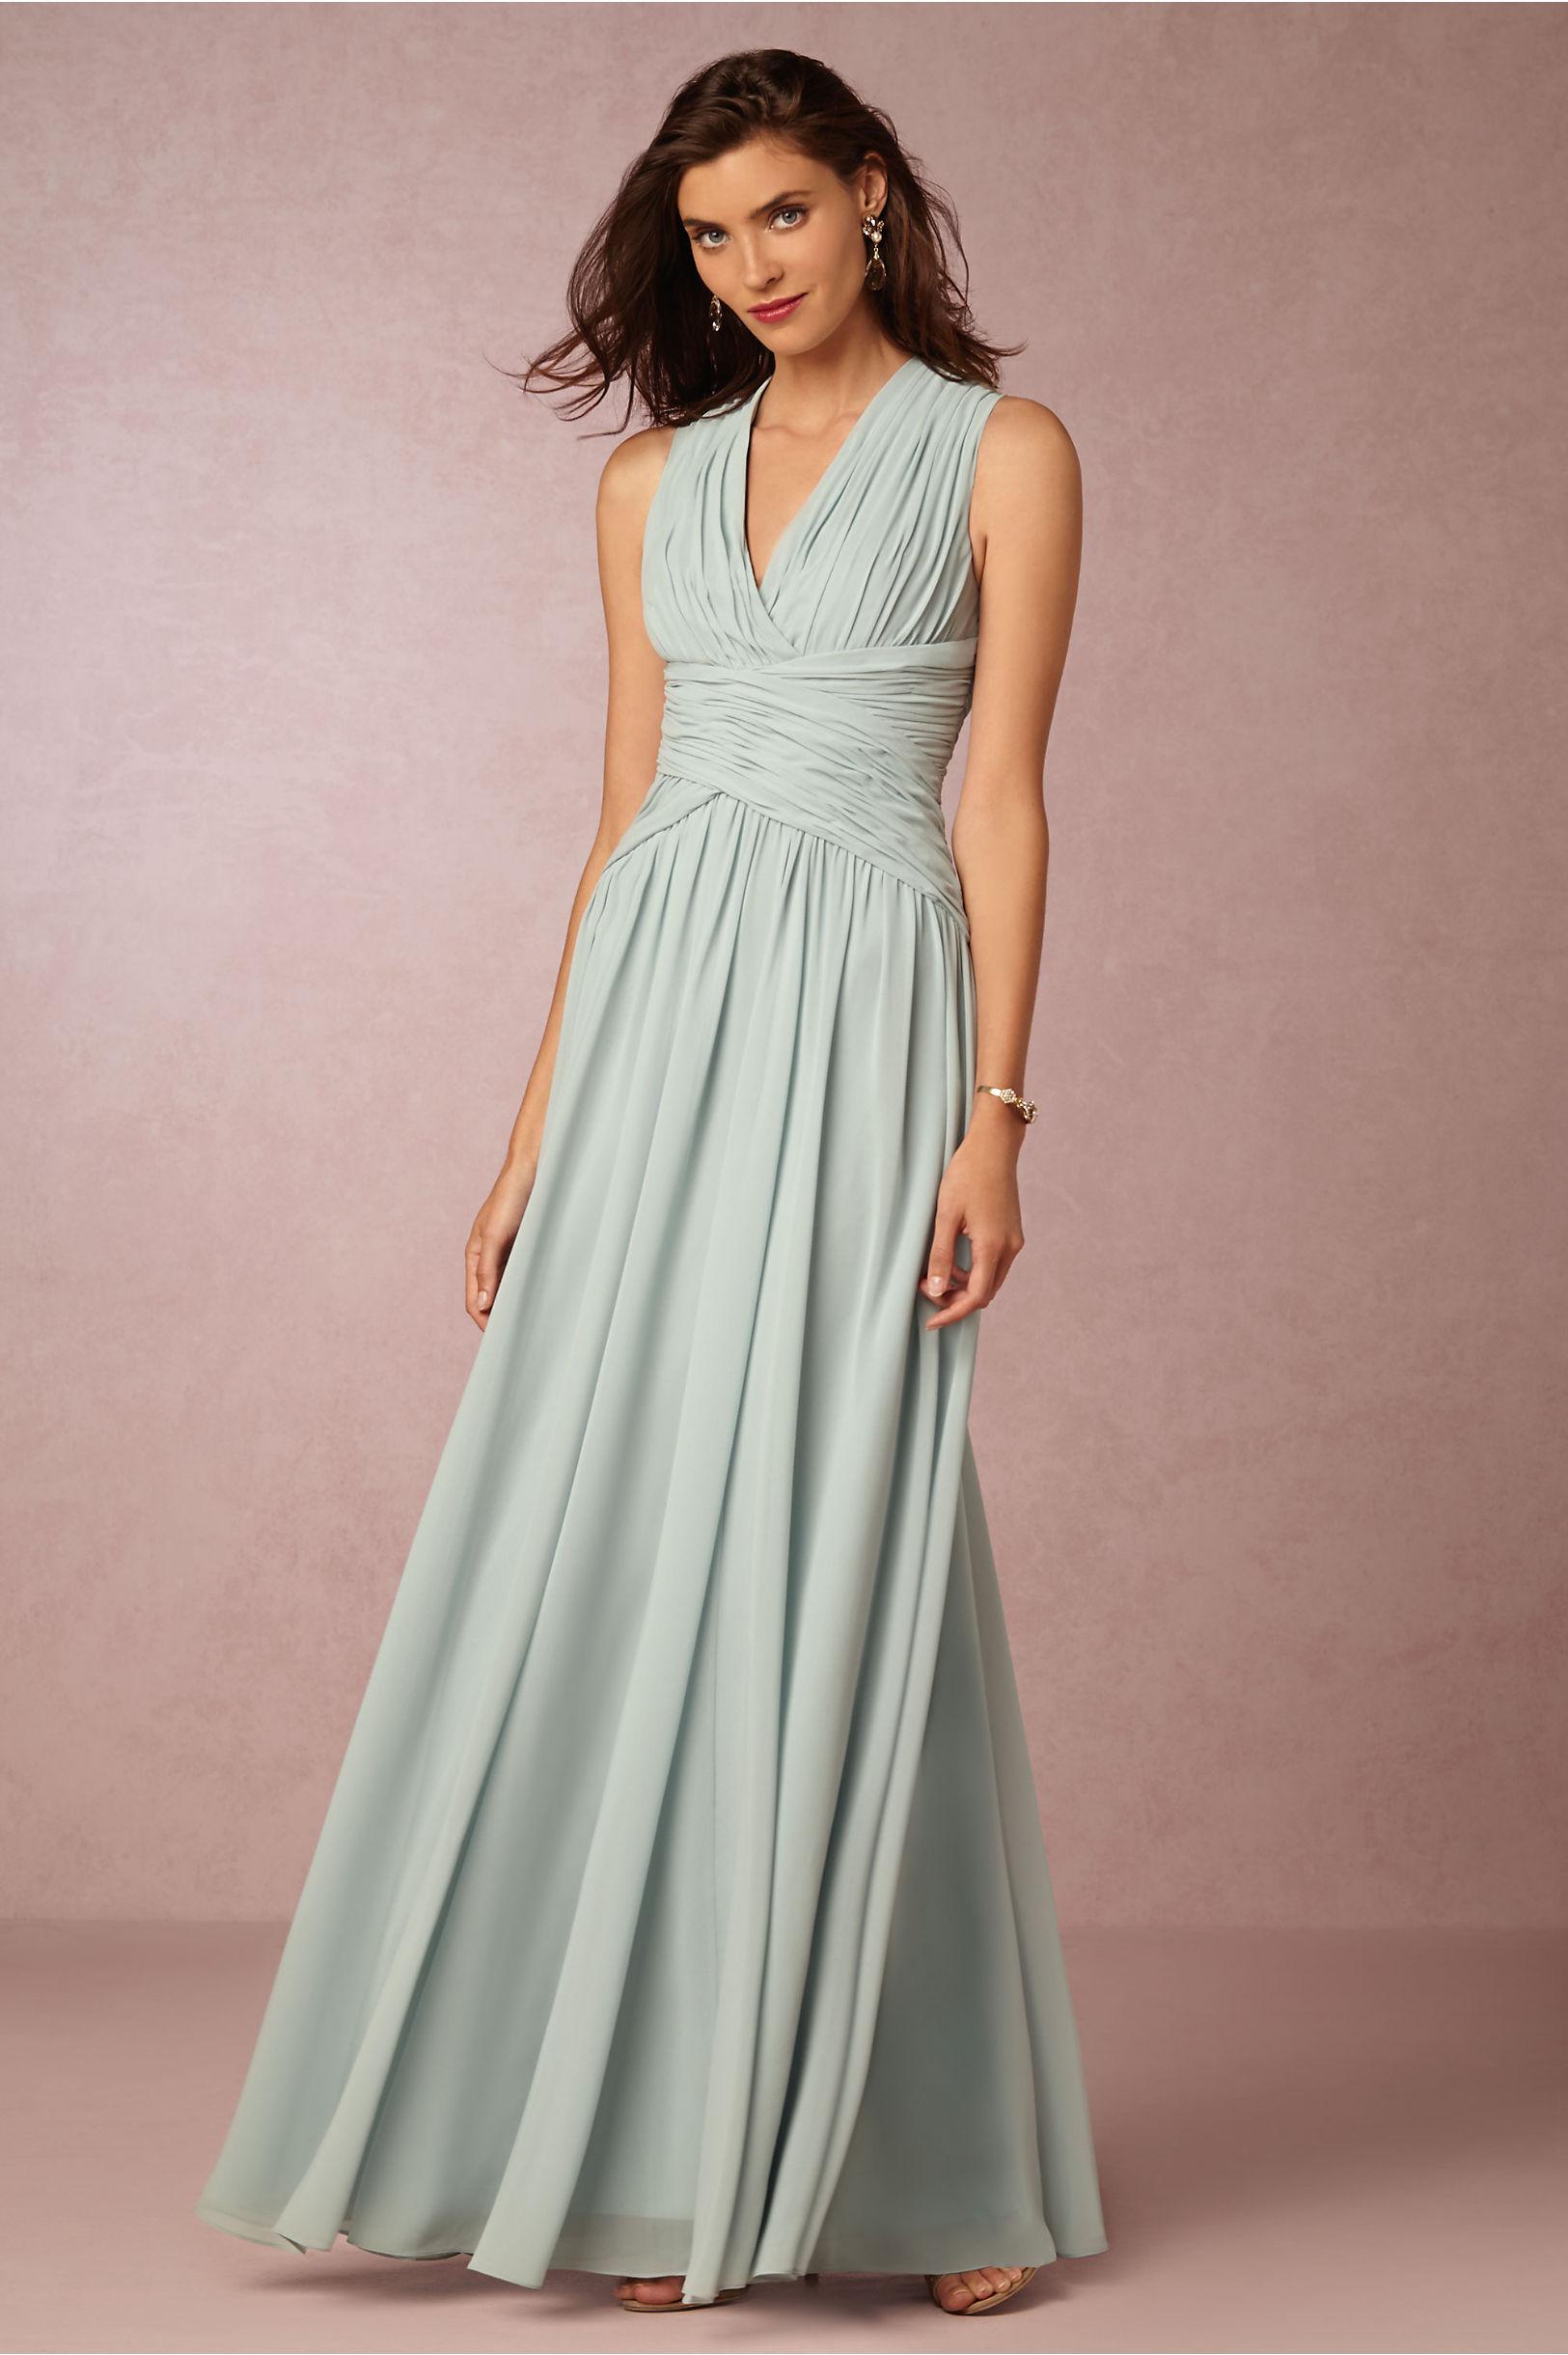 Paloma Dress in Bridal Party | BHLDN